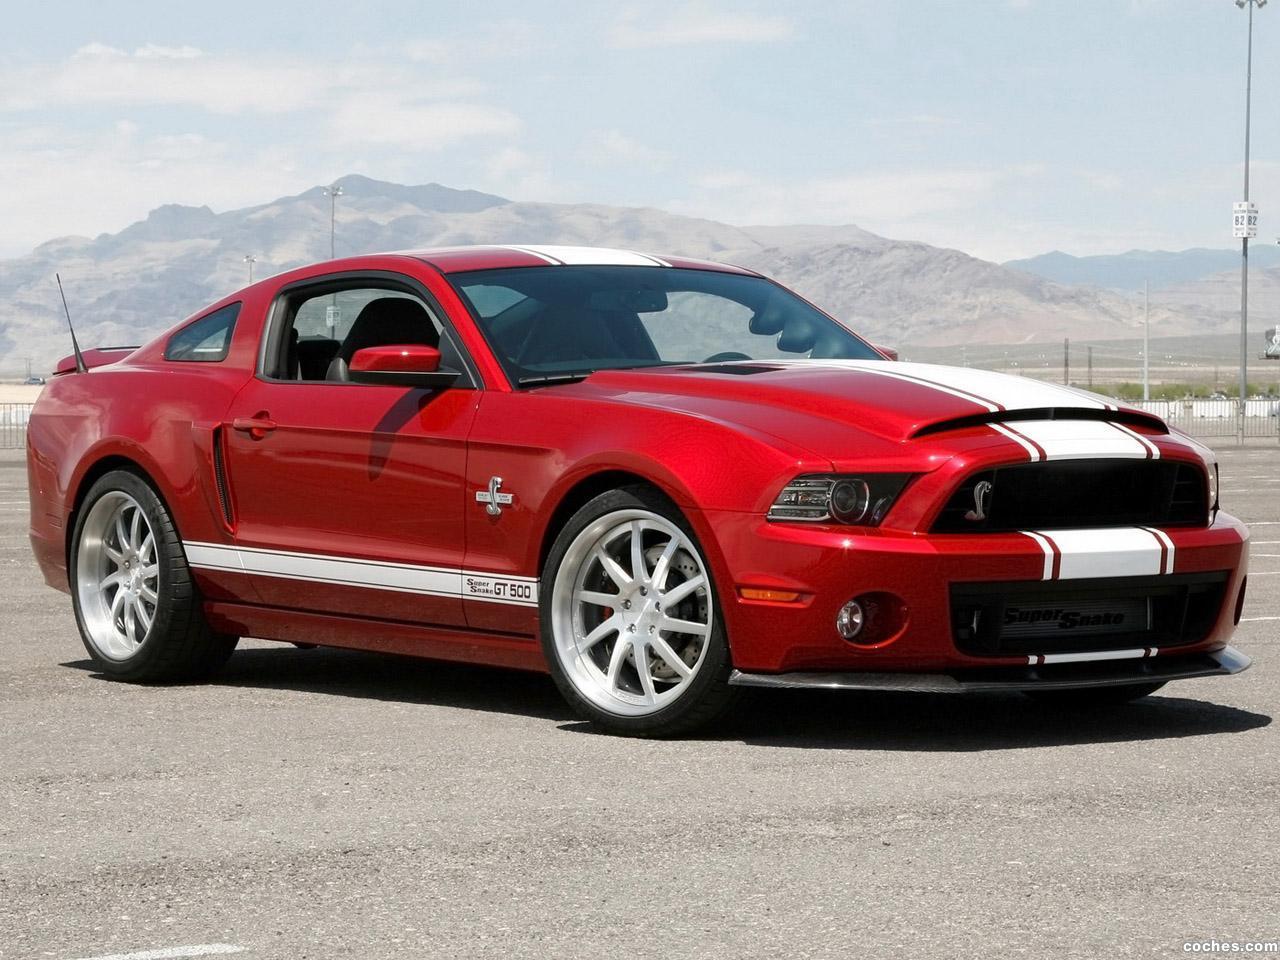 Fotos de Ford Shelby Mustang GT500 Super Snake 2013  Foto 7